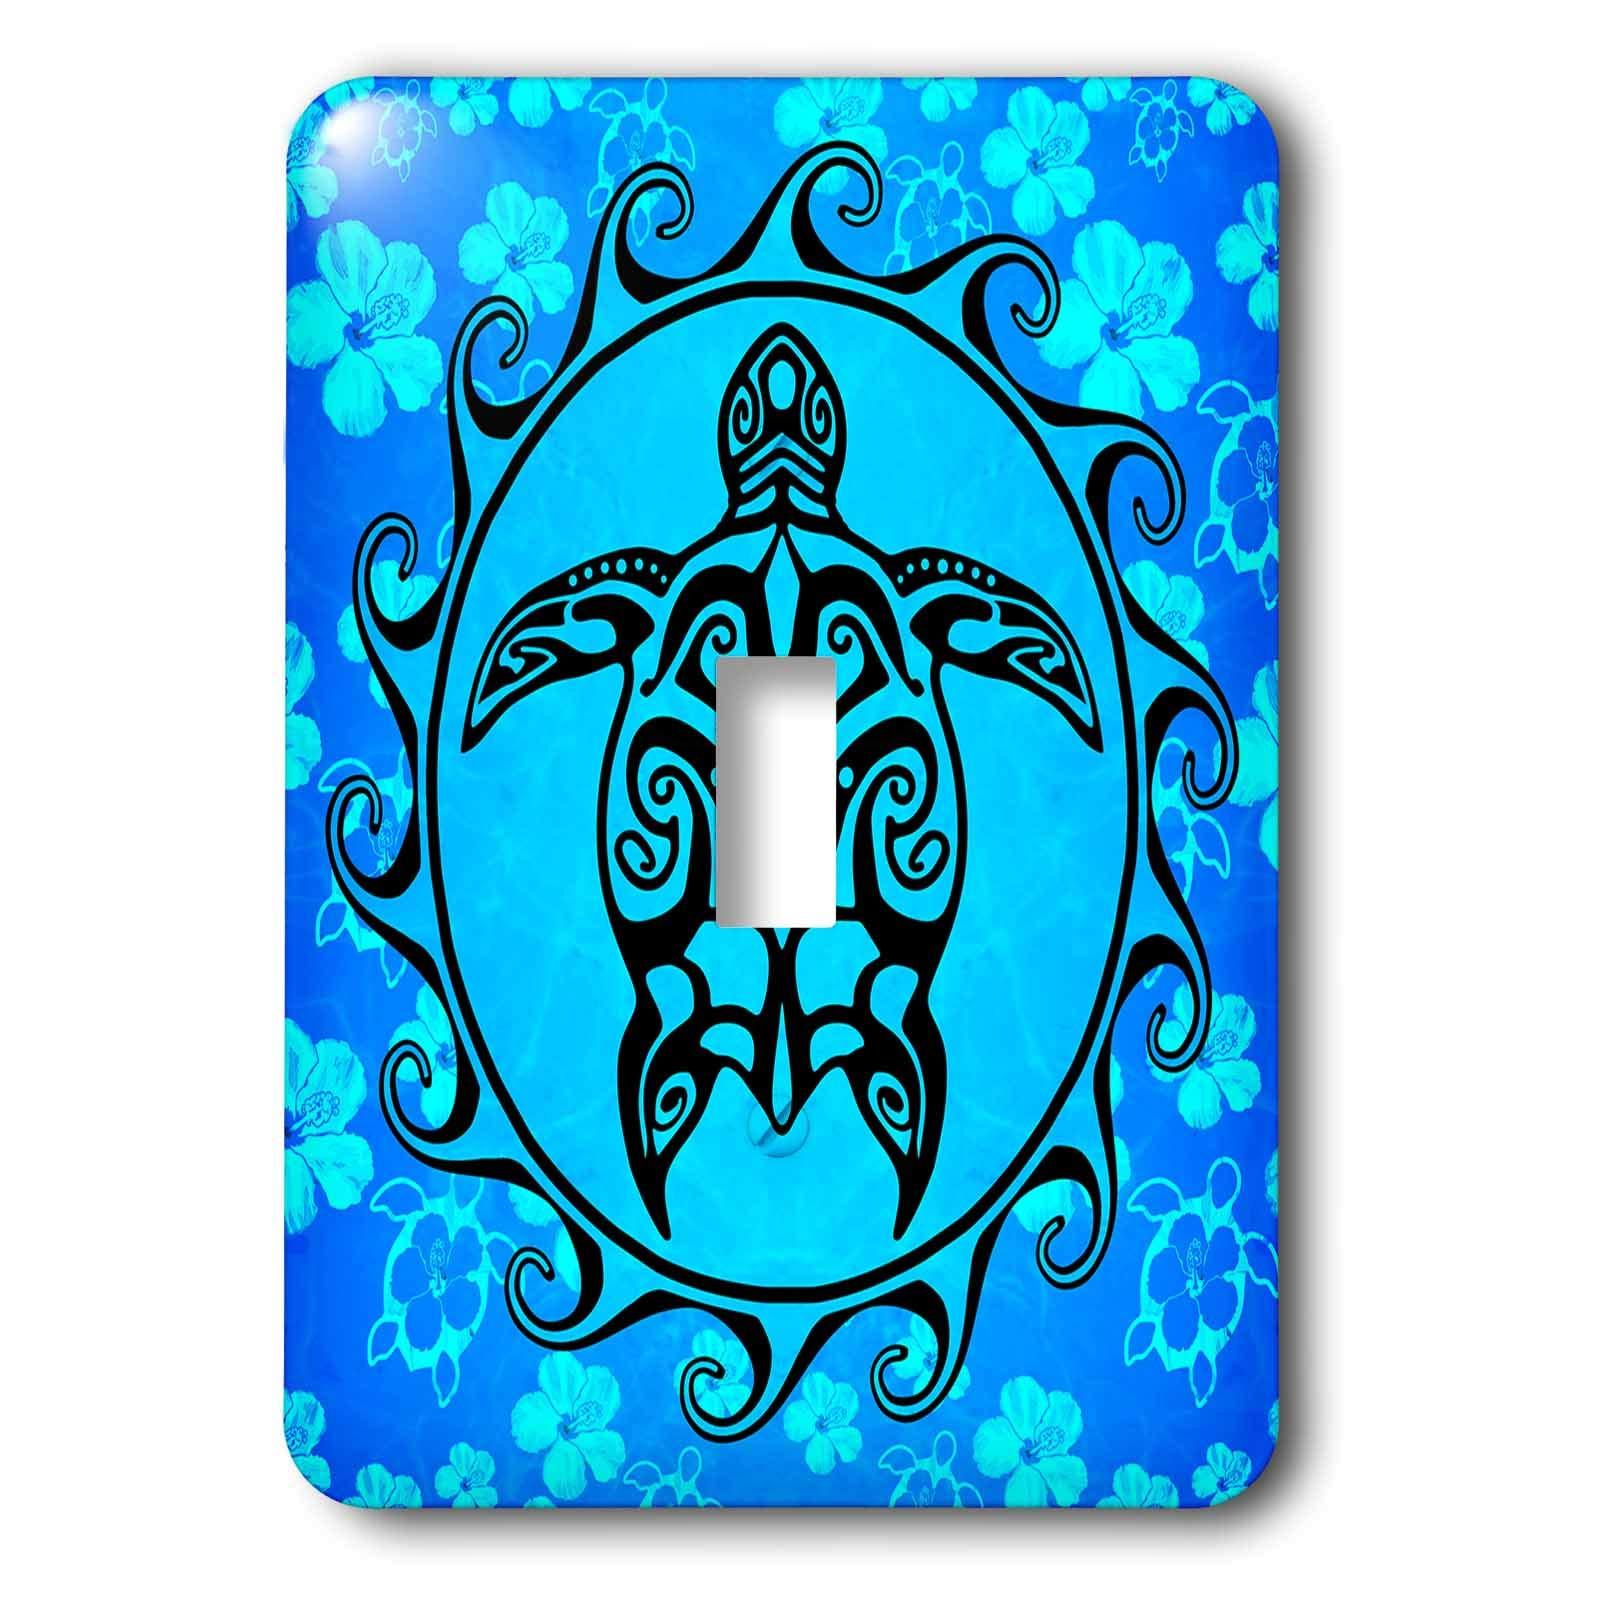 3dRose MacDonald Creative Studios – Tribal Animals - Ocean blue tribal sea turtle, Maori Sun Polynesian symbol and pattern. - Light Switch Covers - single toggle switch (lsp_295357_1)